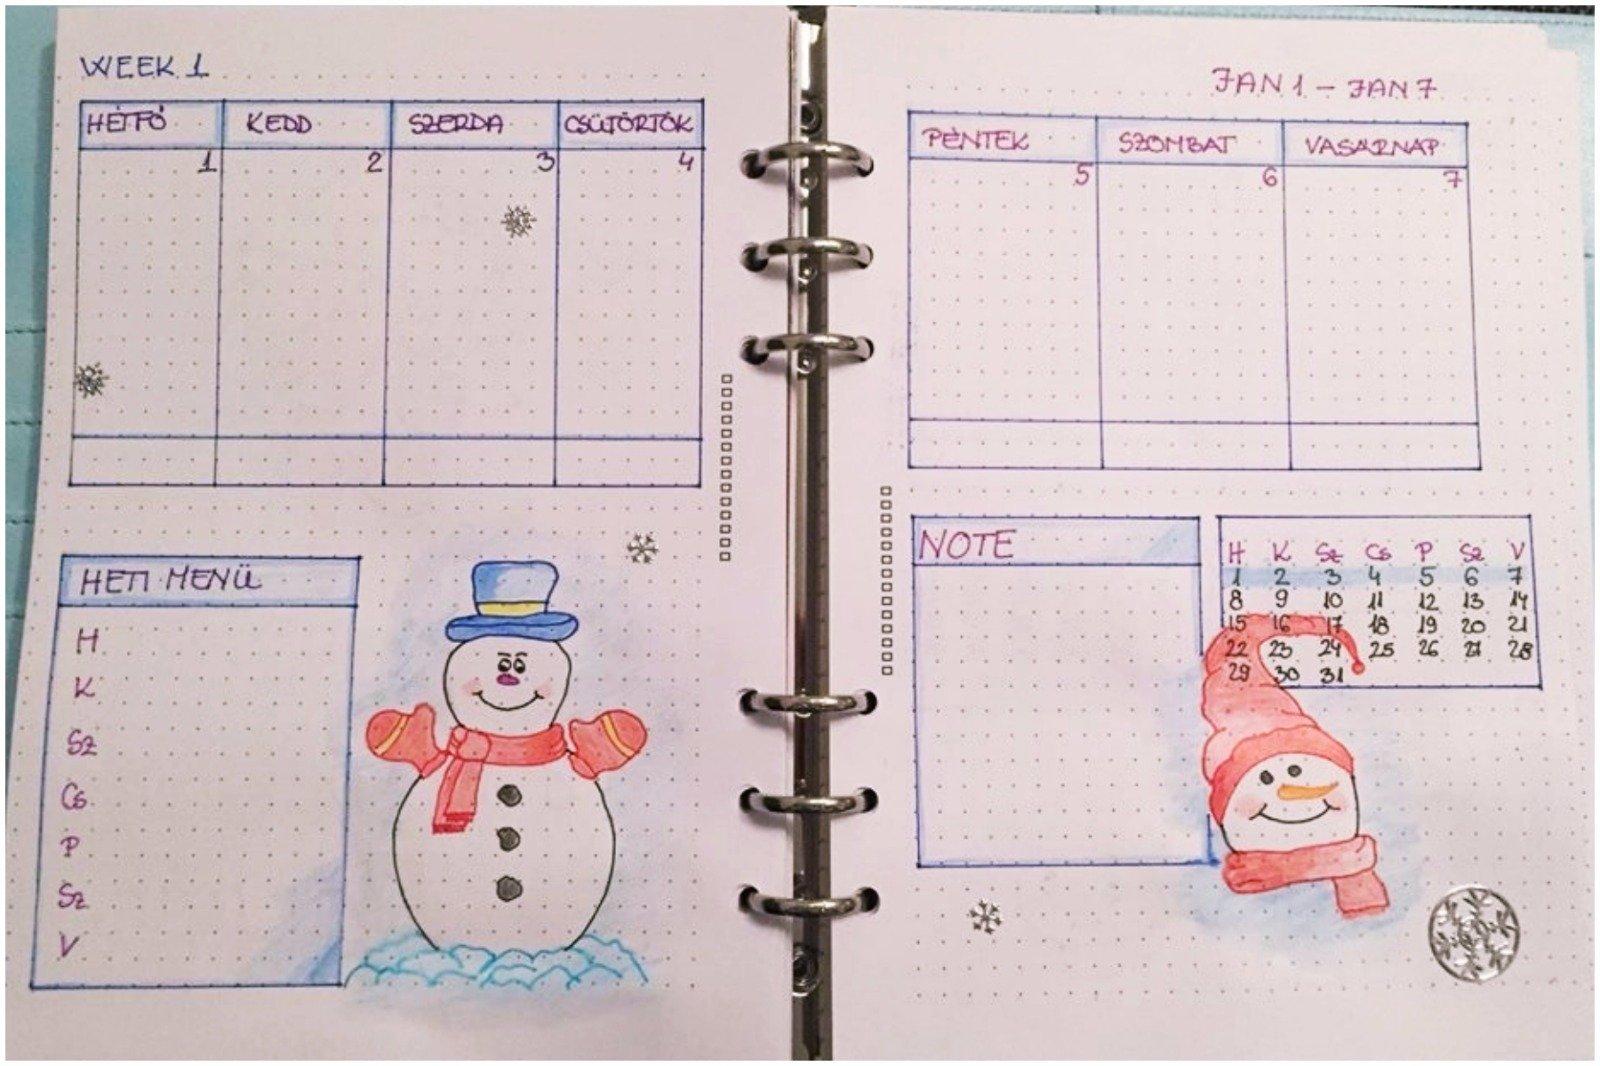 Creative journal weekly planner - week 1 - itstartswithacoffee.com #creativejournaling #weekly #weeklyplanner #2018 #january #2018January #planner